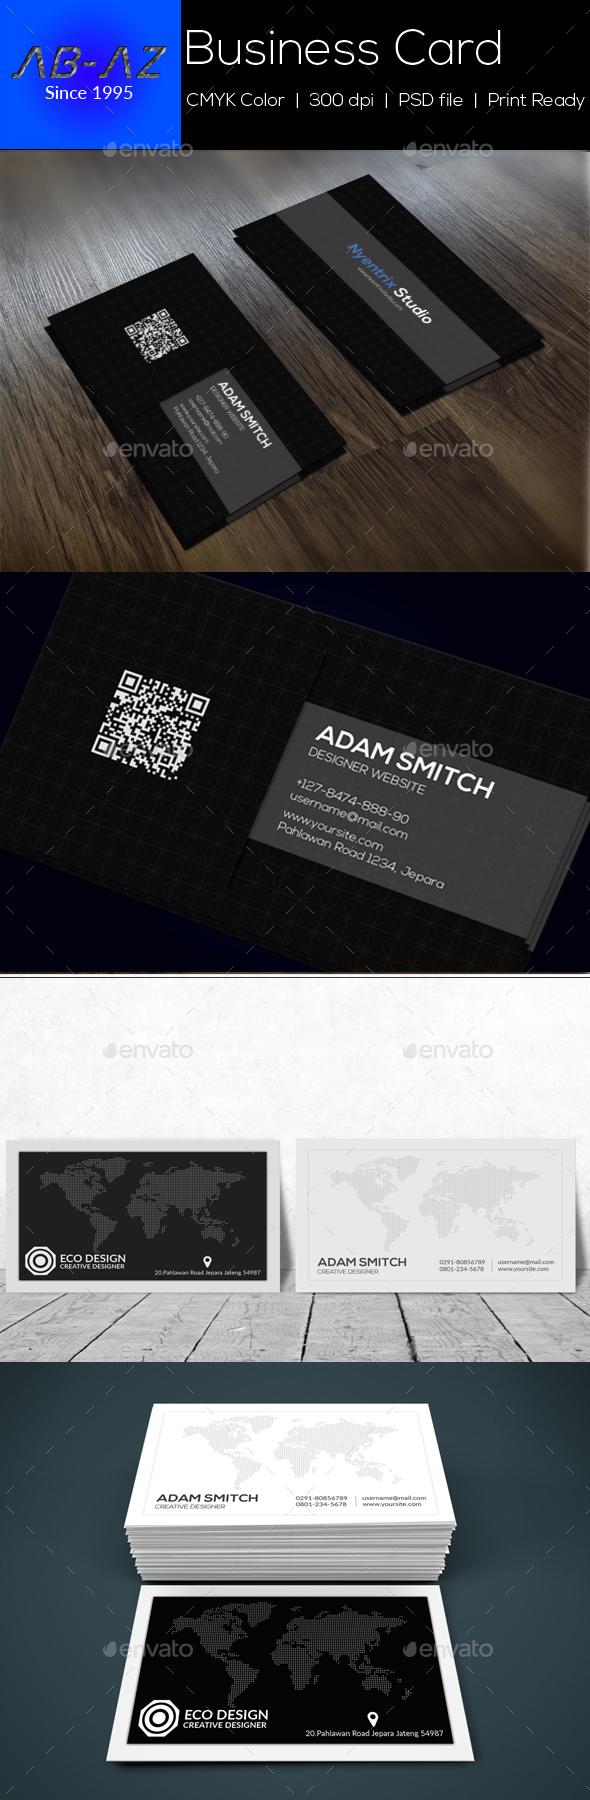 Simple Bundle Business Card - Corporate Business Cards